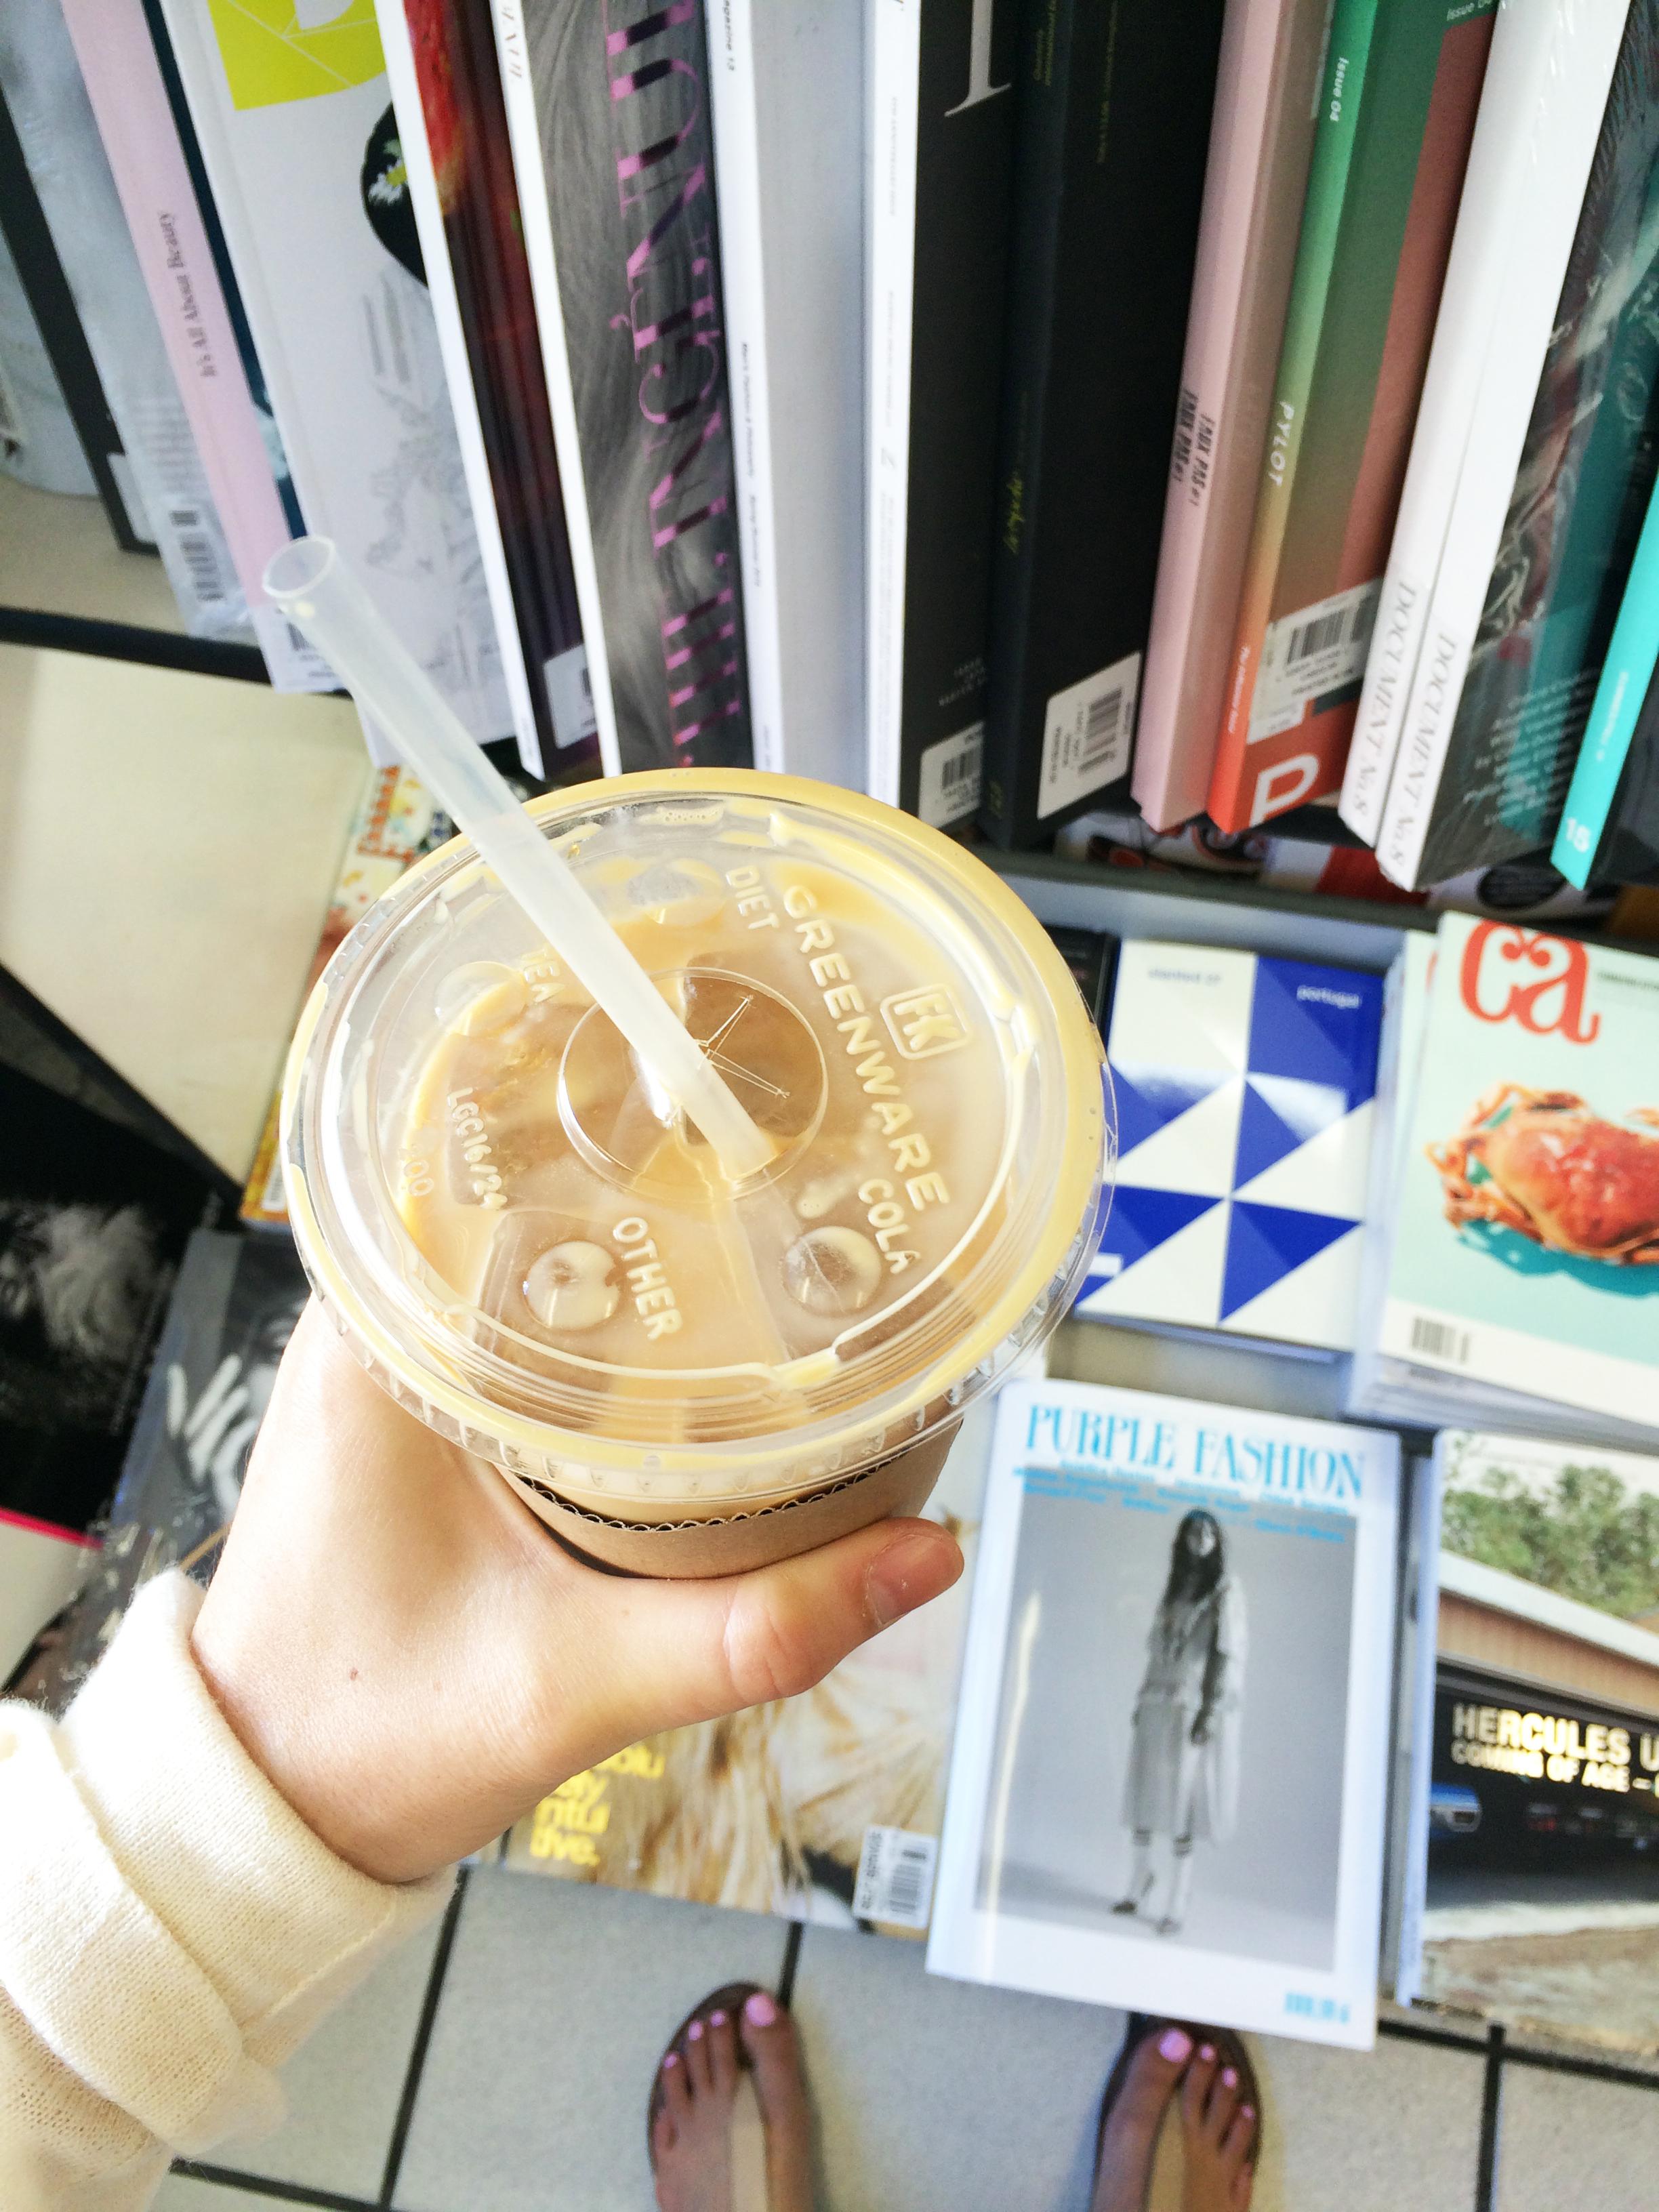 coffee and magazine heaven